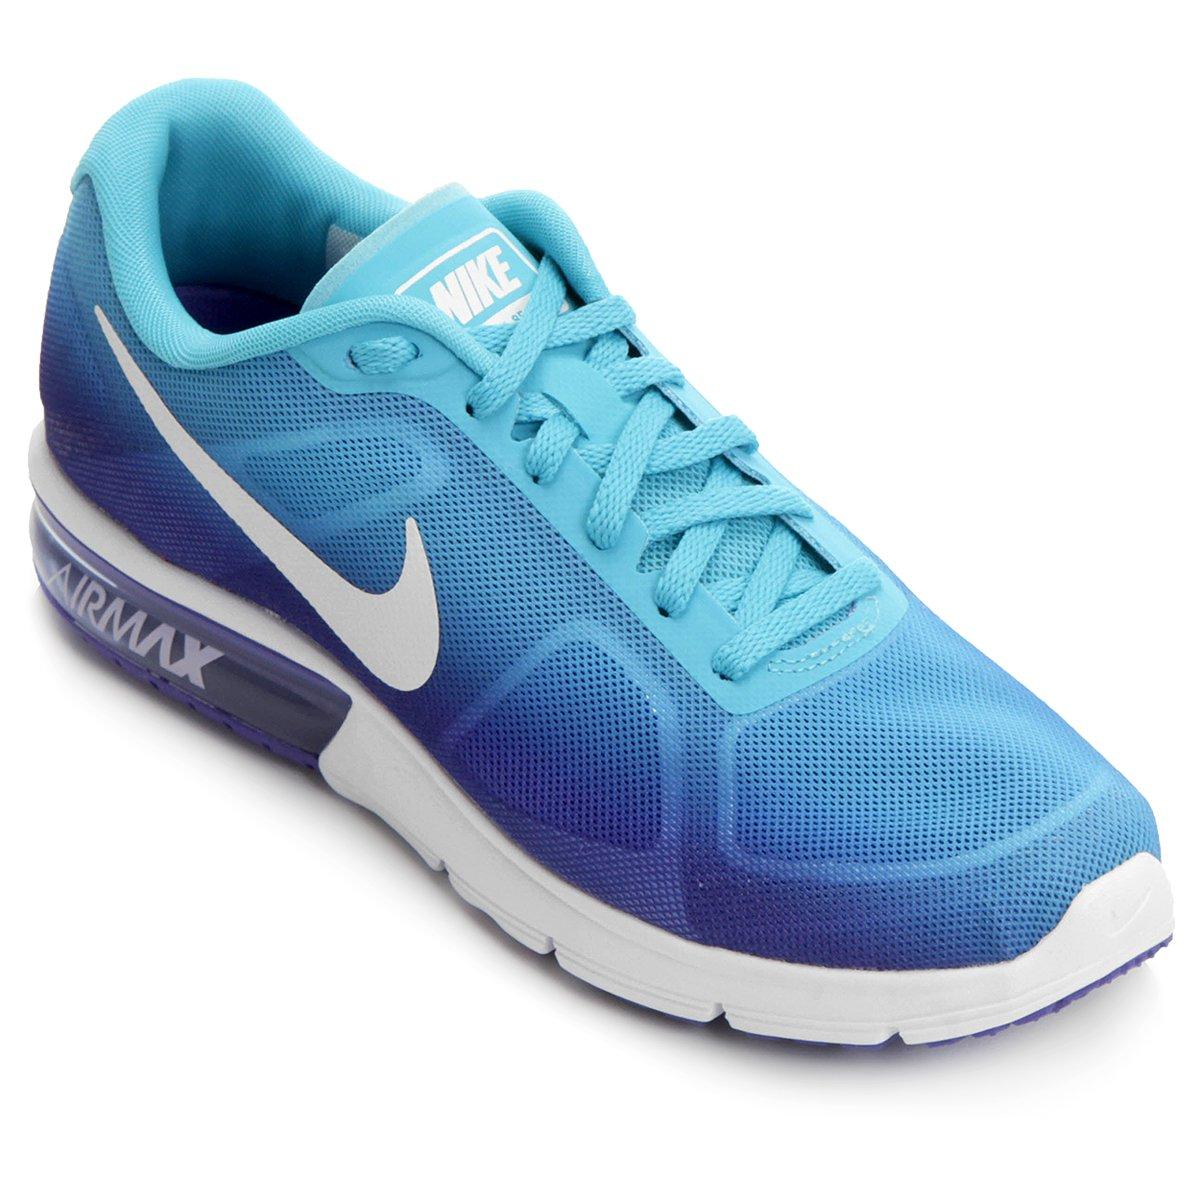 1053009fbe0 Tênis Nike Air Max Sequent Feminino - Compre Agora